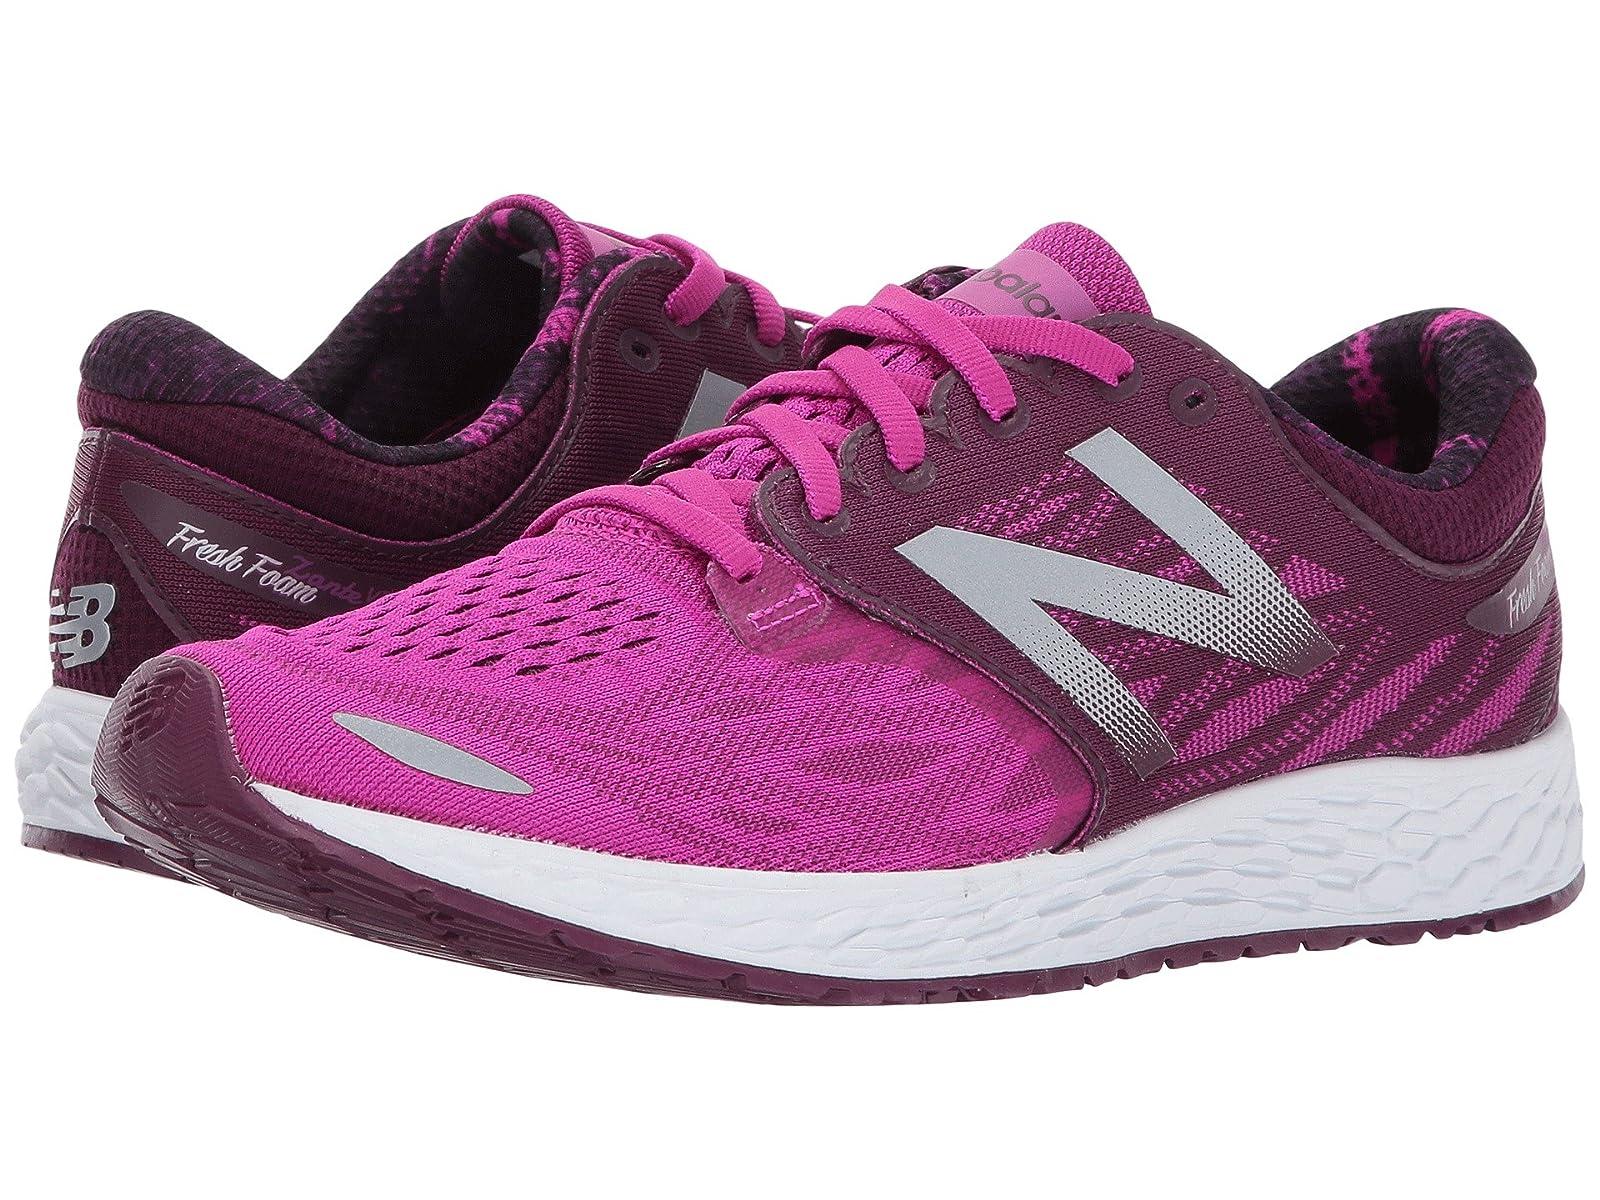 New Balance Fresh Foam Zante V3Cheap and distinctive eye-catching shoes